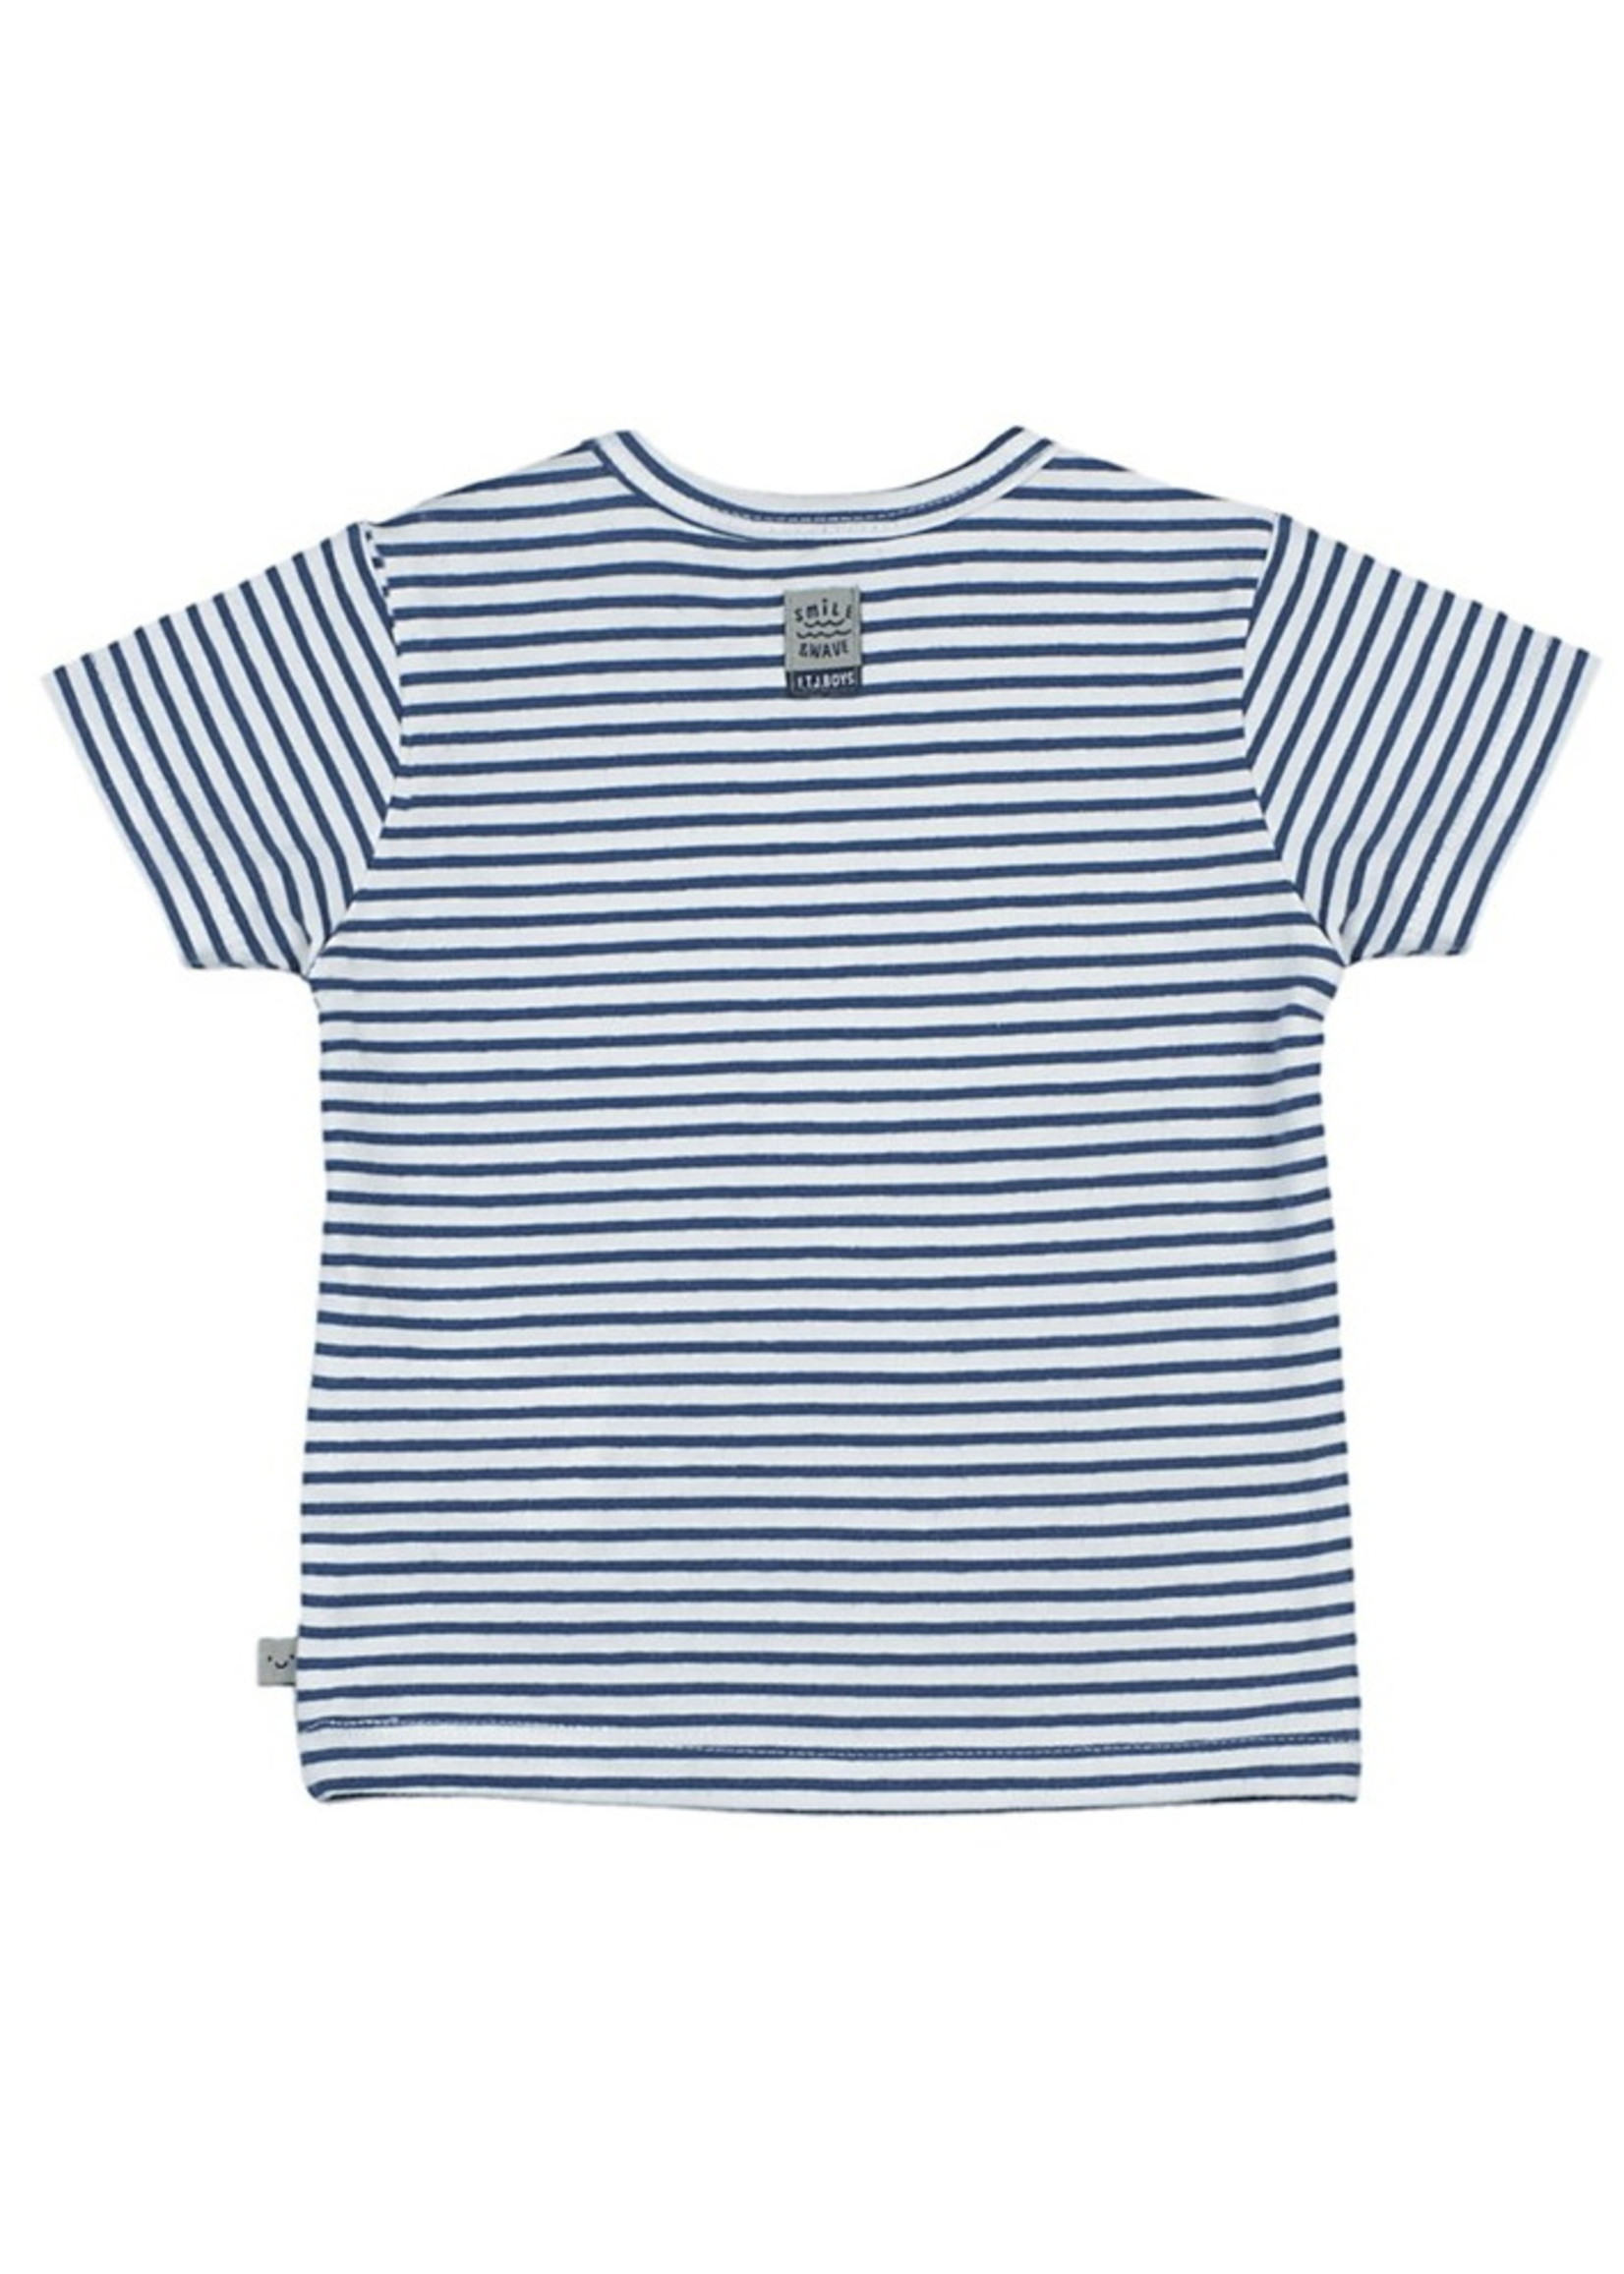 Feetje T-shirt maat 56